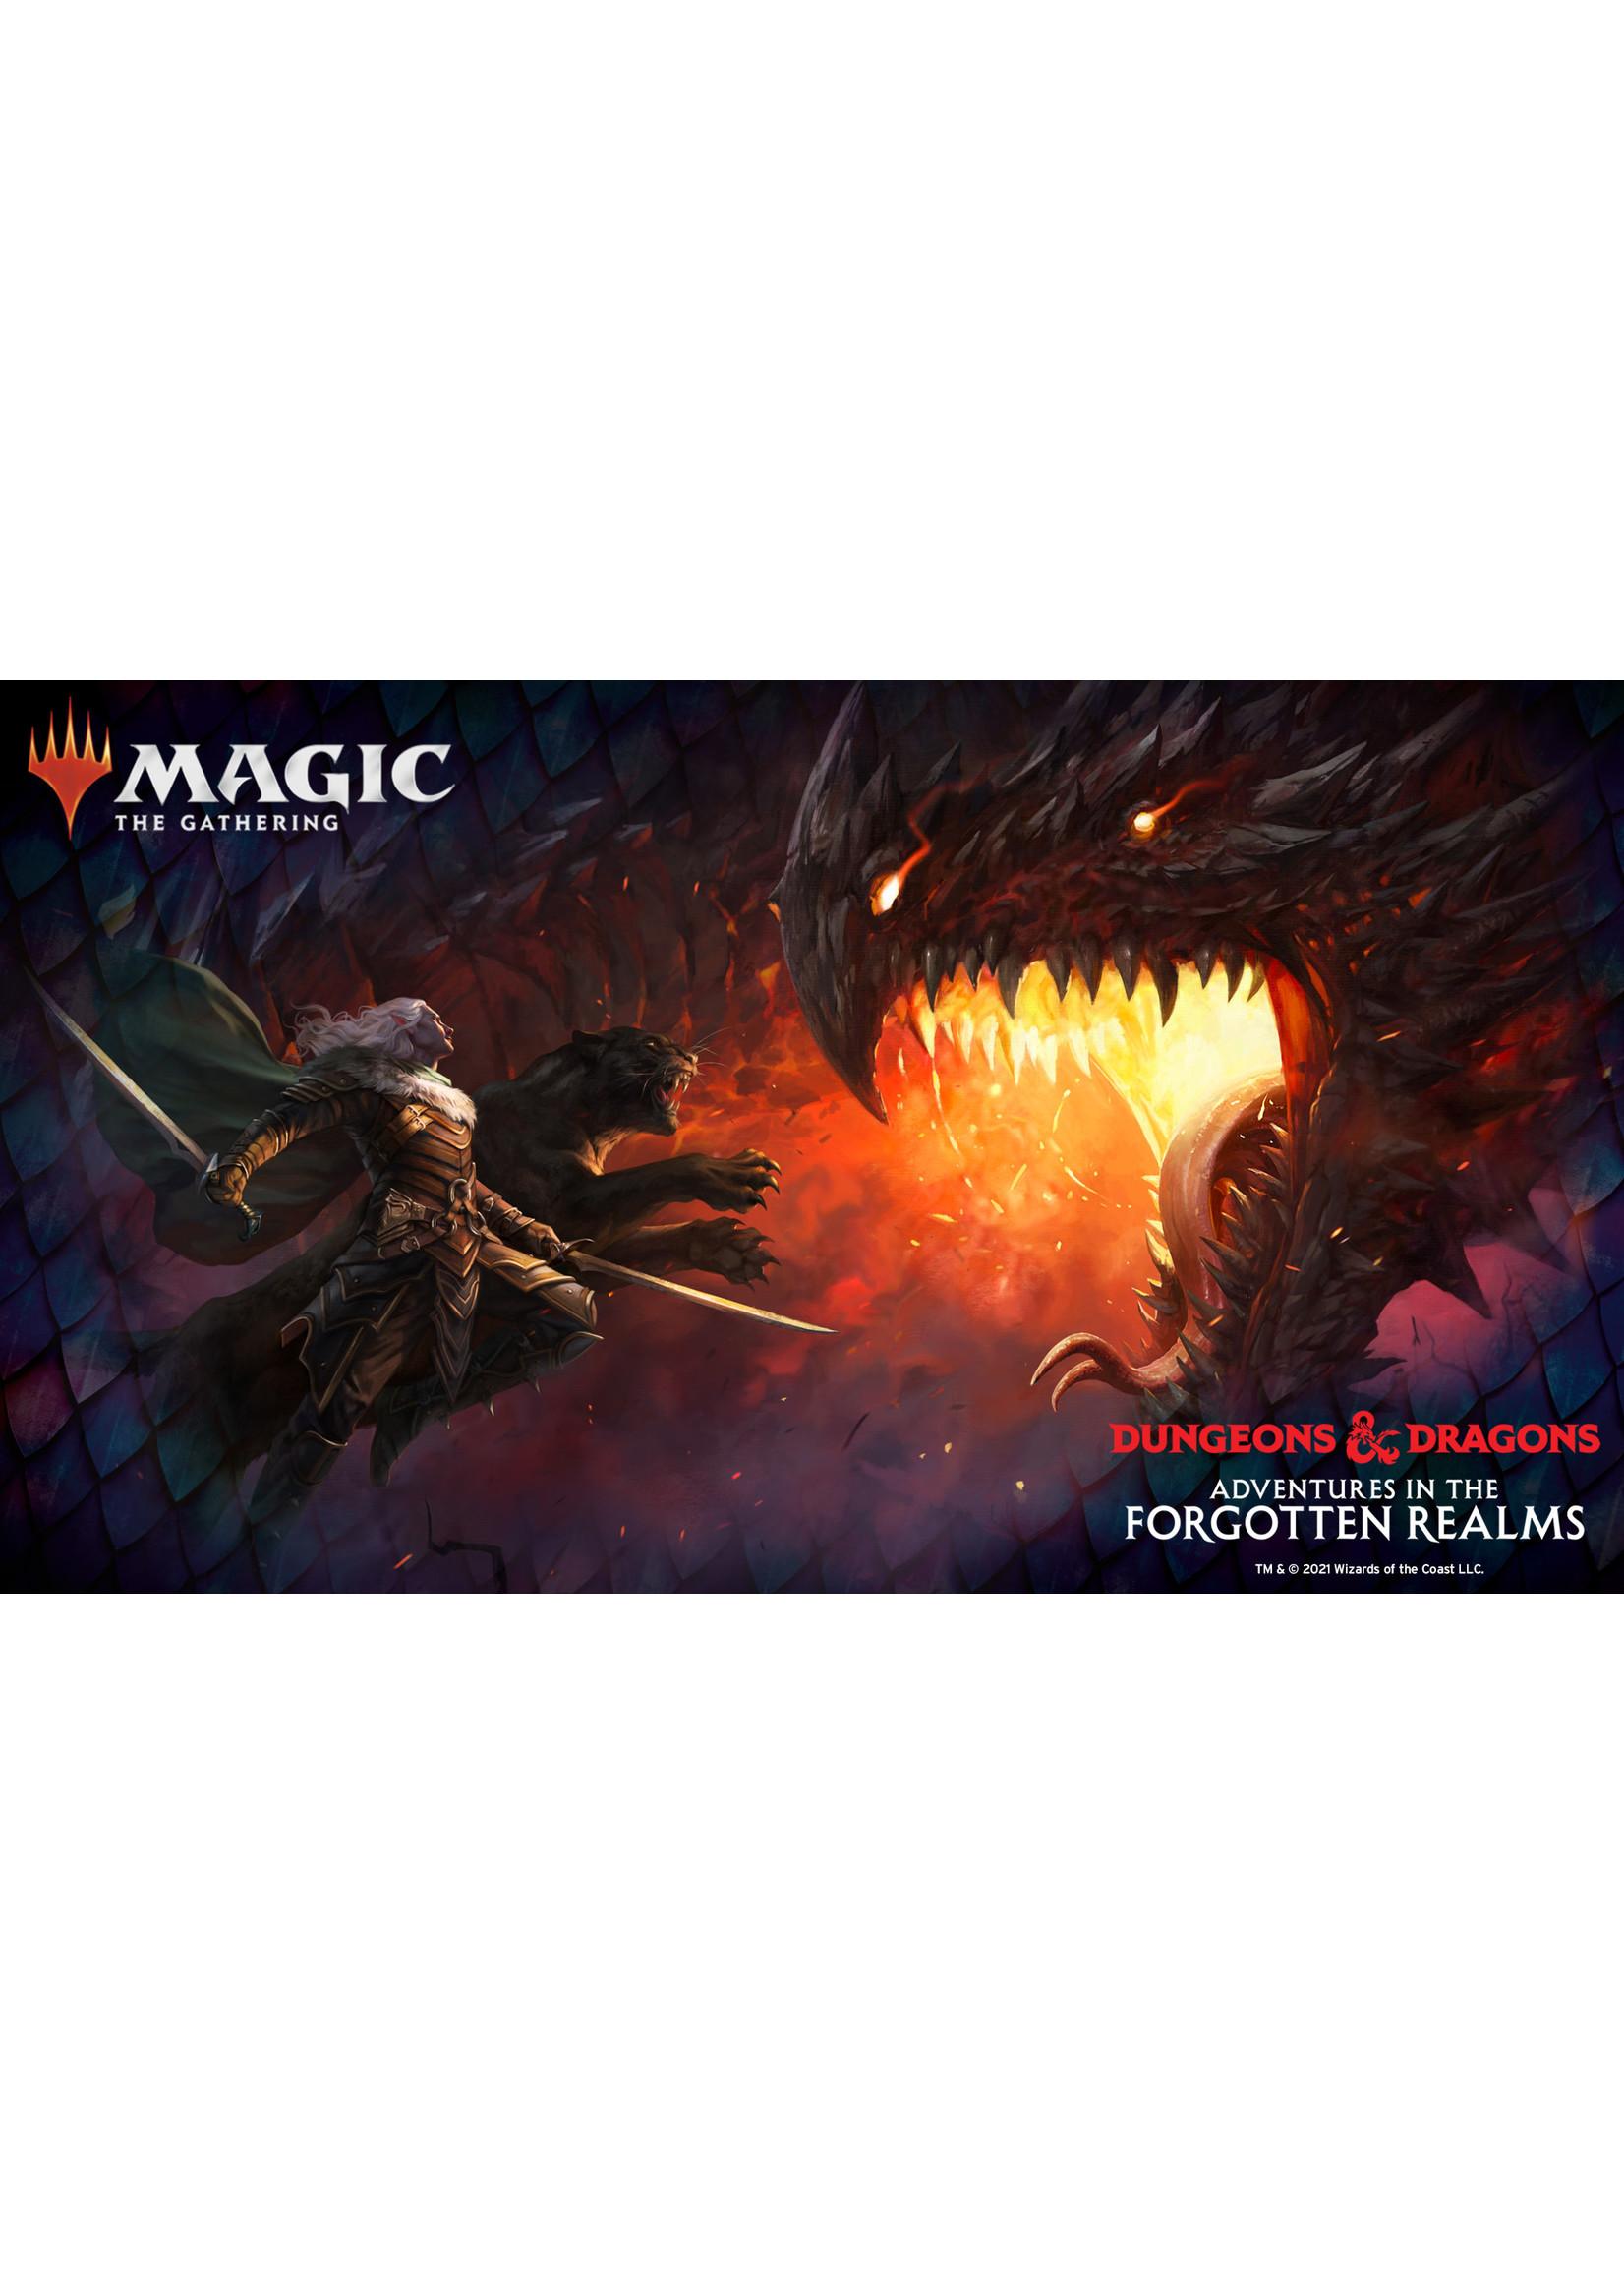 Wizards of the Coast Mtg Adv Forgotten Realms Arena Starter Kits